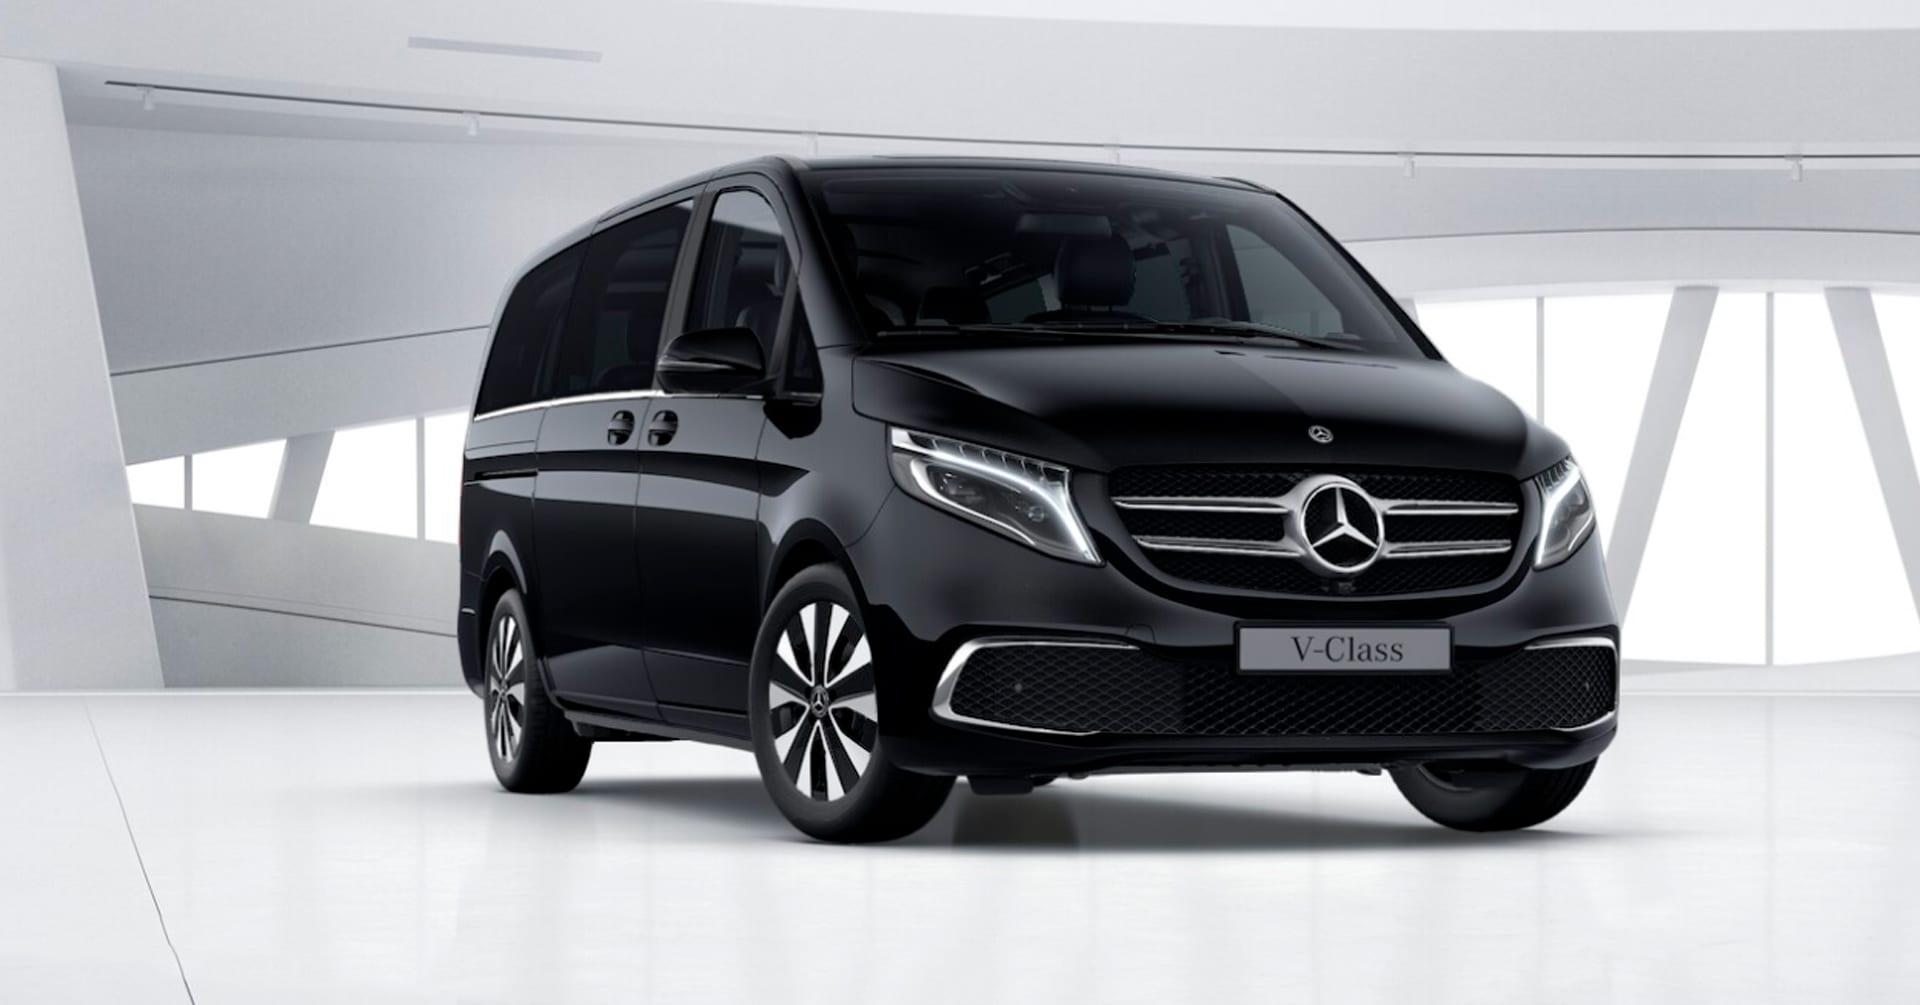 Mercedes-Benz V-Class 5152600154